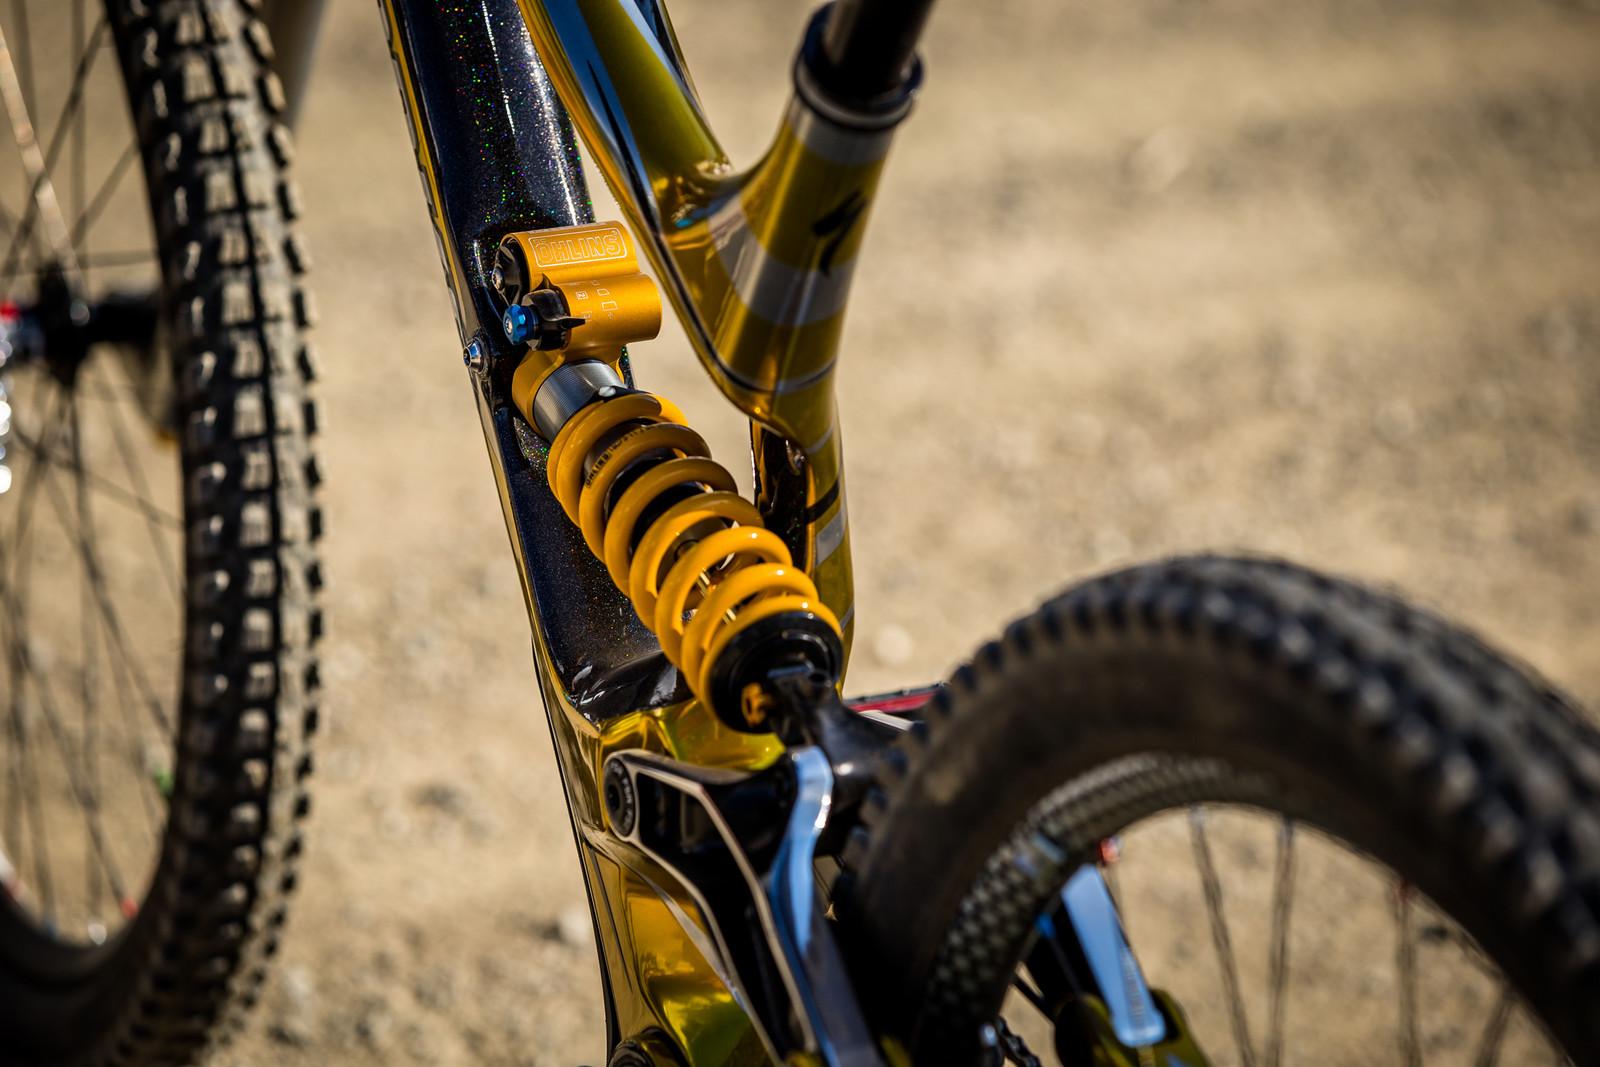 Ohlins TTX Shock - WINNING BIKE - Loic Bruni's Specialized Demo - Mountain Biking Pictures - Vital MTB